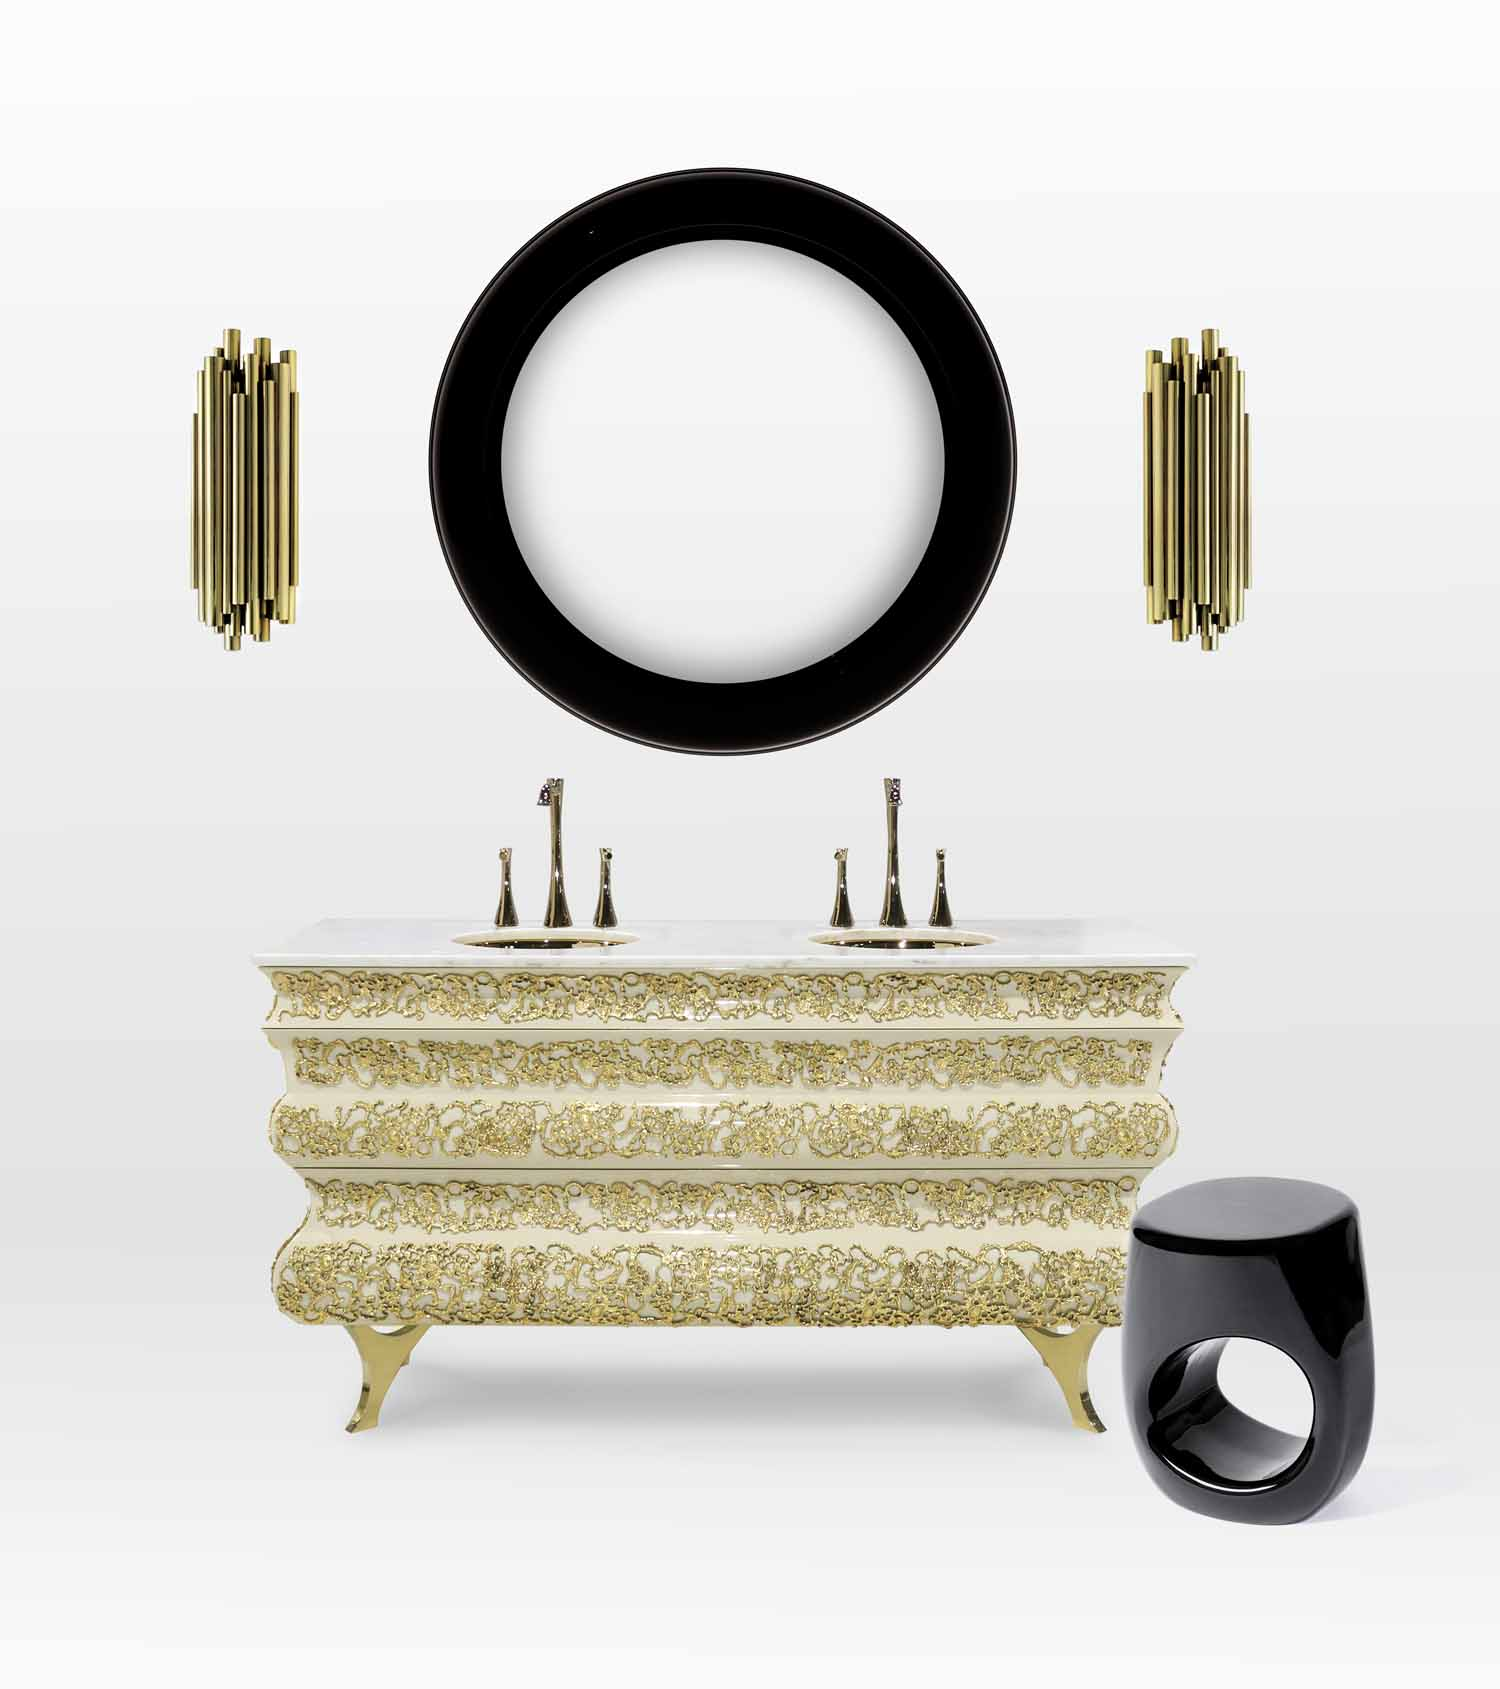 crochet-washbasin-ring-mirror-1-HR